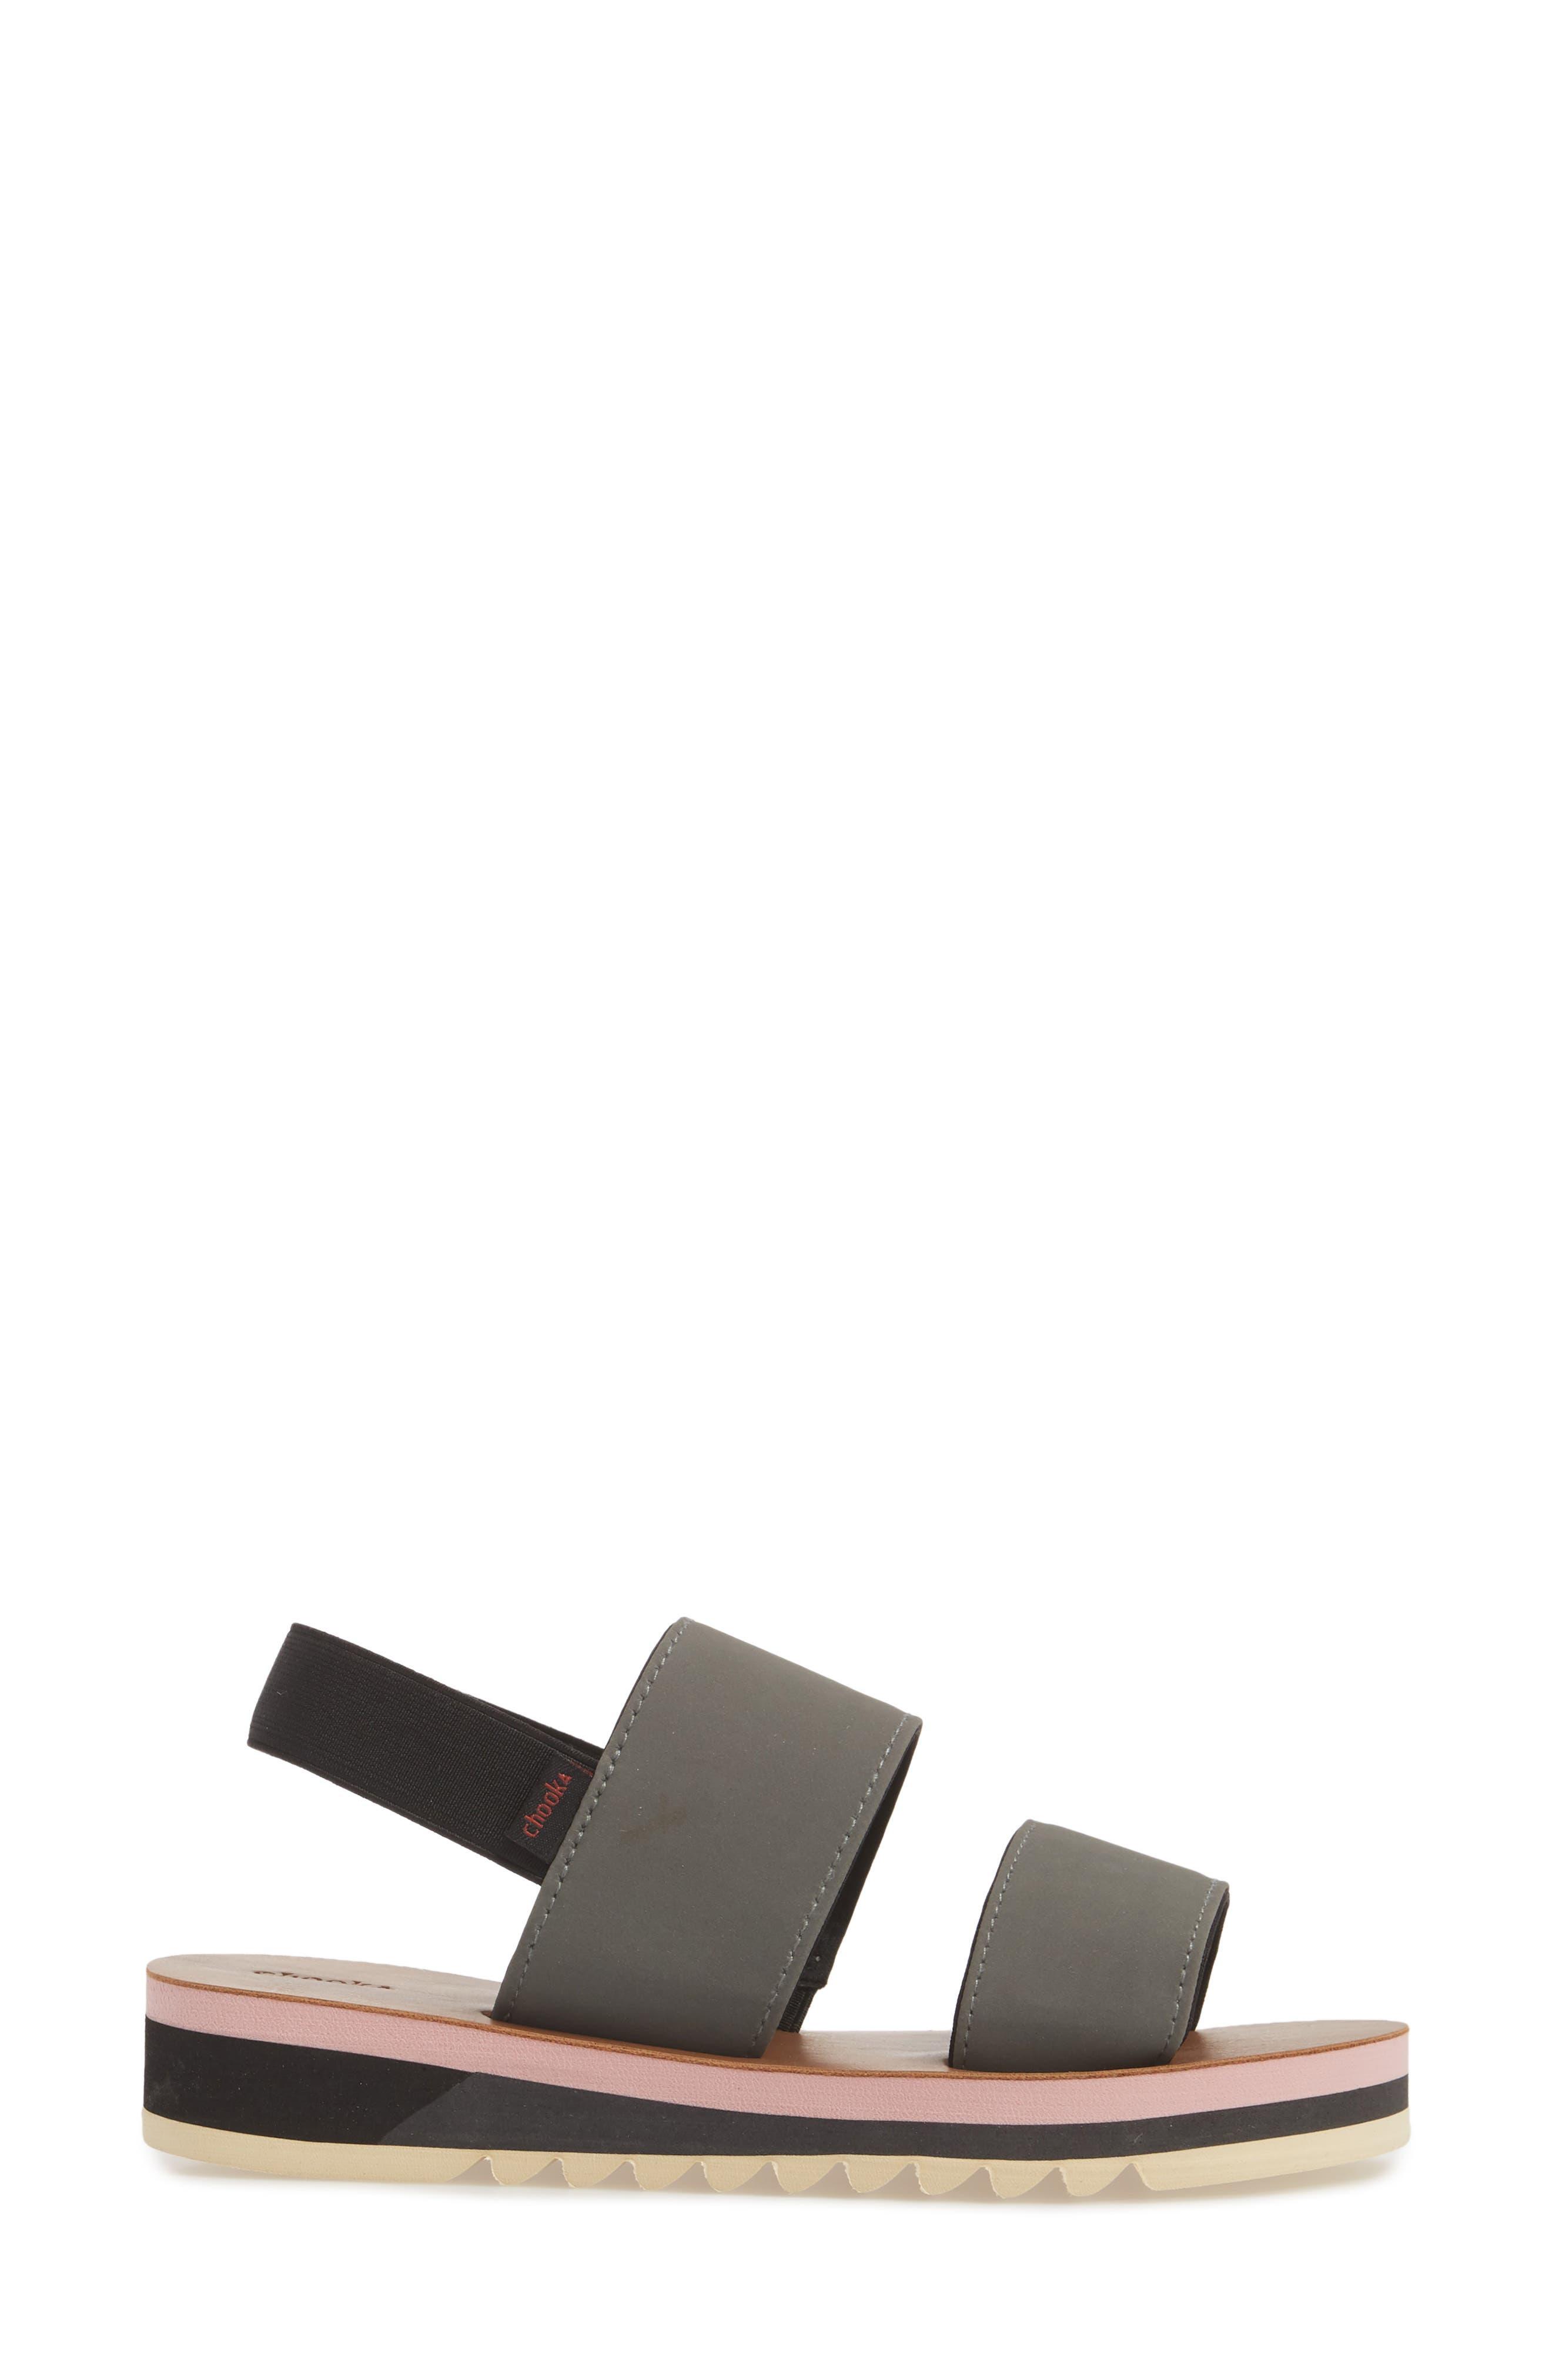 Flatform Sandal,                             Alternate thumbnail 3, color,                             GREY